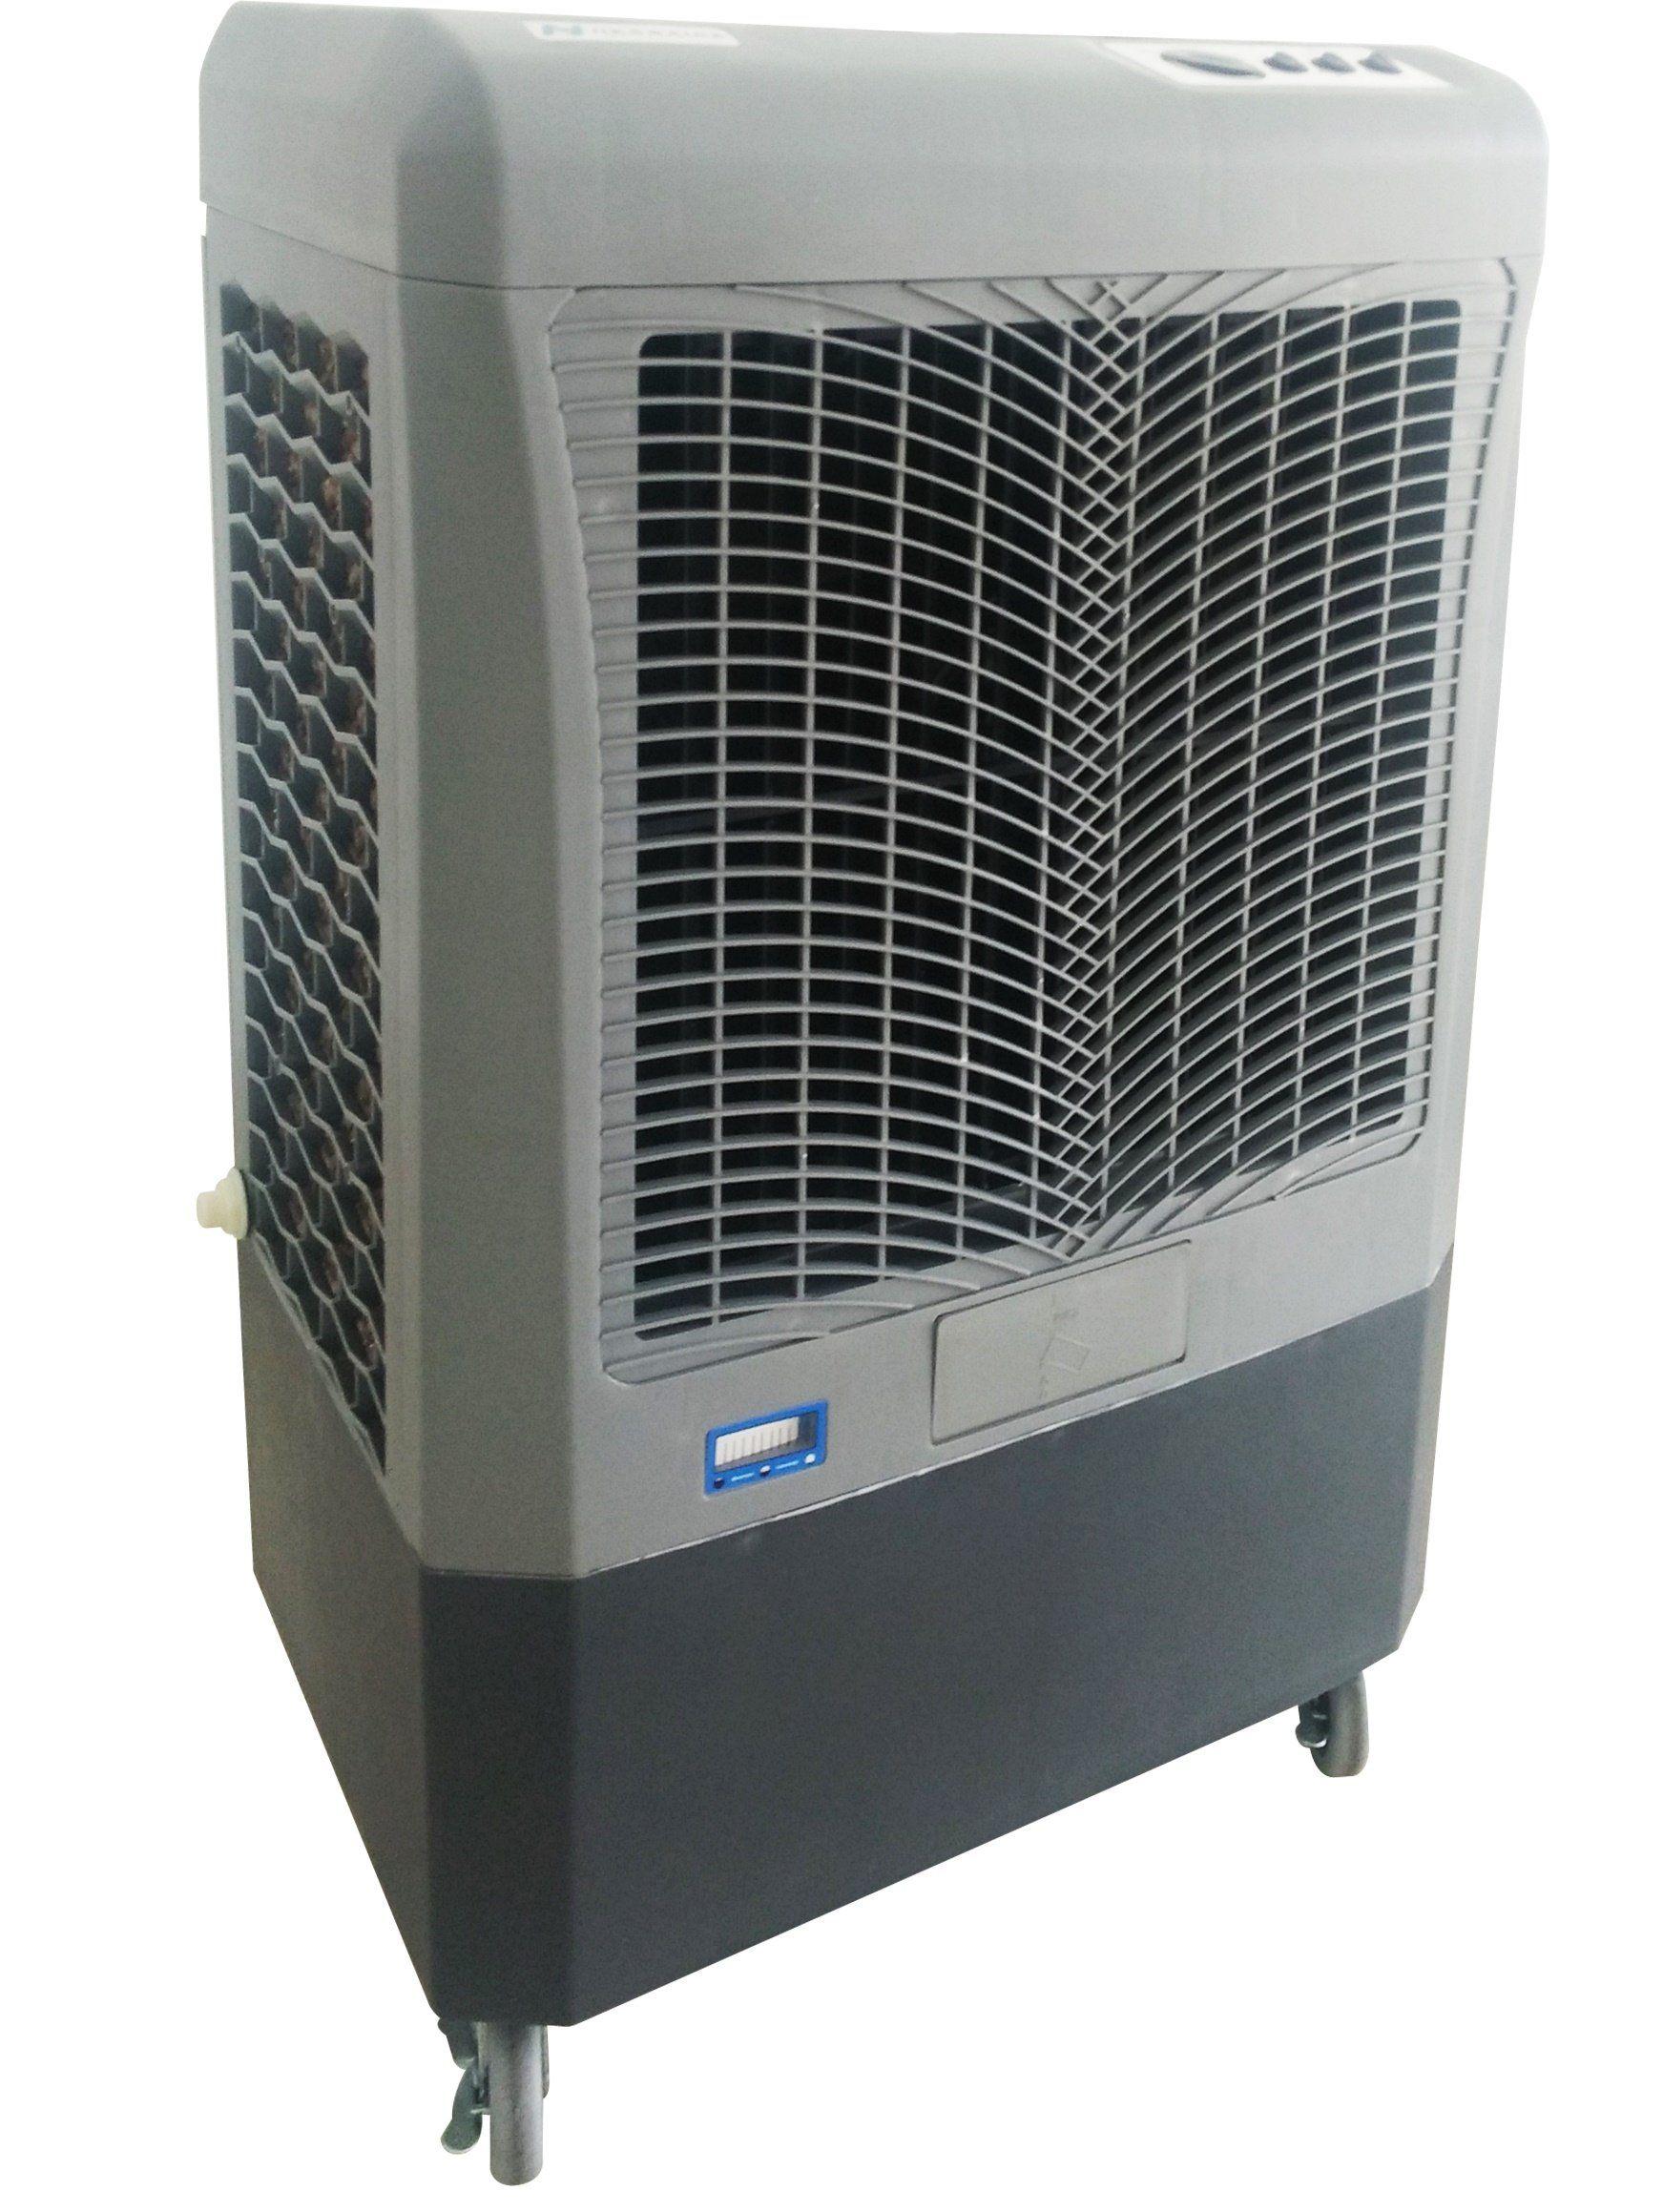 Hessaire Mc37m Portable Evaporative Air Cooler For 750 Sq Ft Visit The Image Link More Deta Evaporative Cooler Evaporative Coolers Evaporative Air Cooler